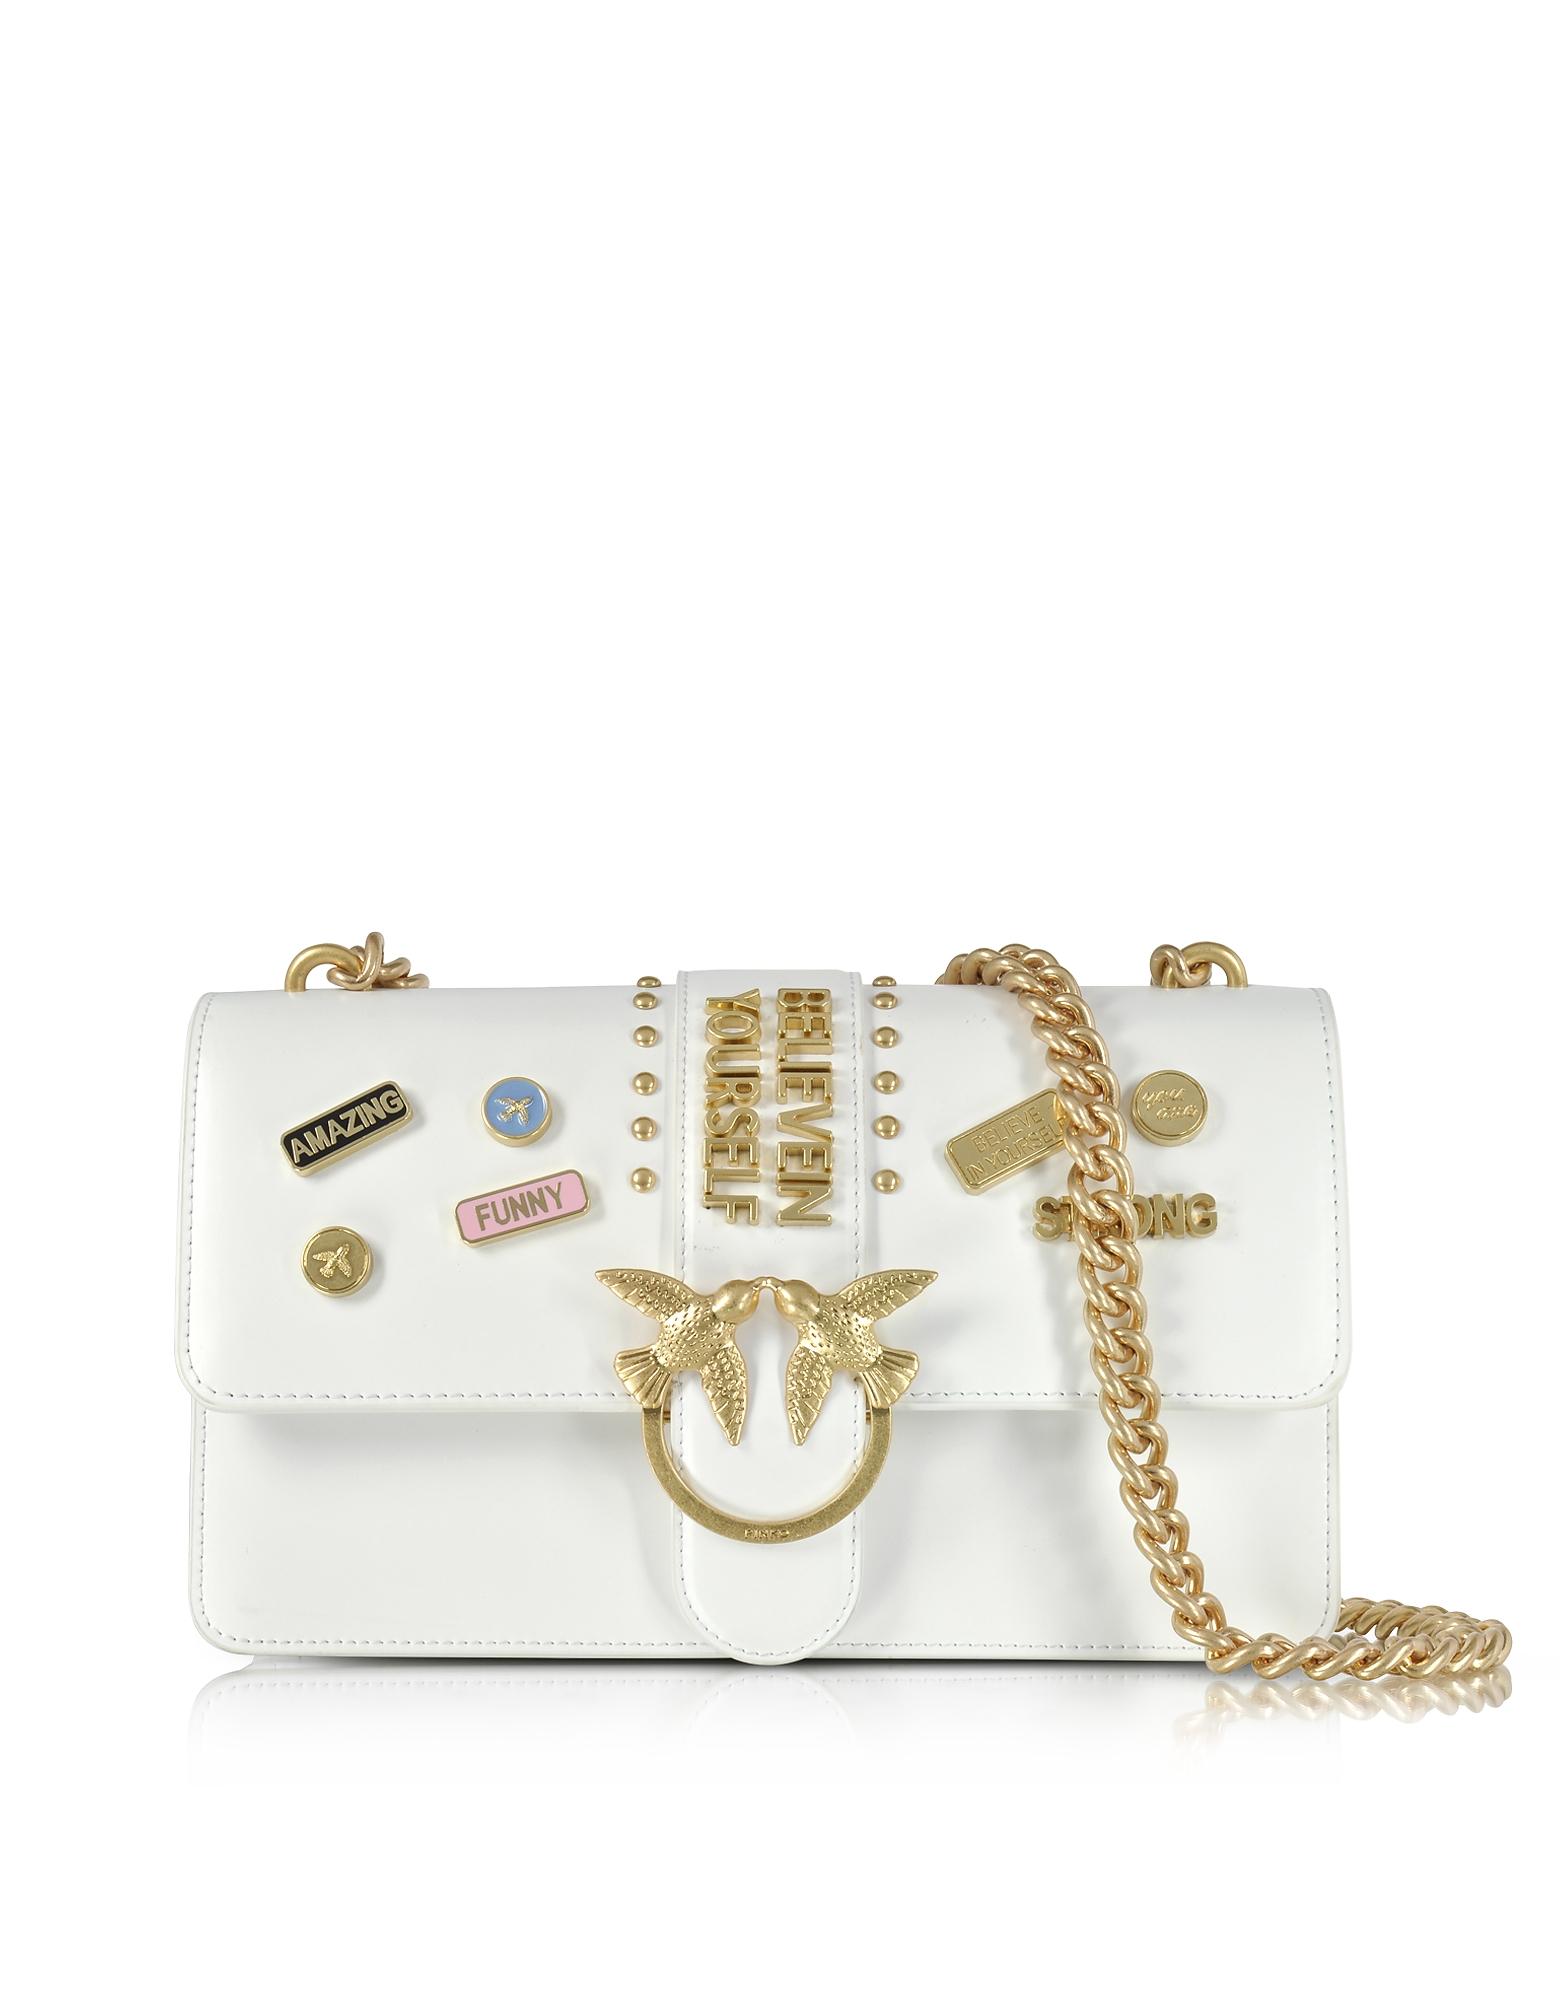 Pinko Handbags, Love Pins White Eco Leather Shoulder Bag